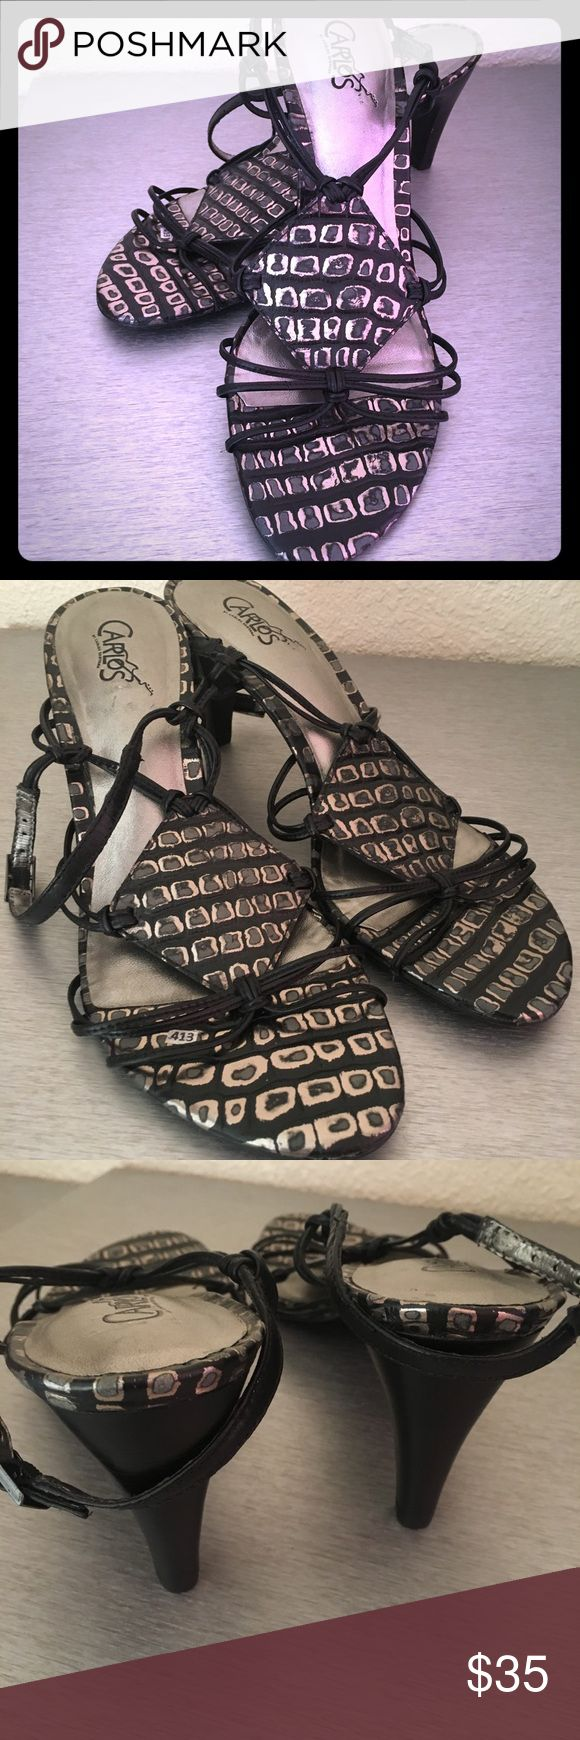 "Strappy Heels Black and silver animal print Strappy pumps. Heel is 3"". Size 7.5. By Carlos Santana Carlos Santana Shoes Heels"